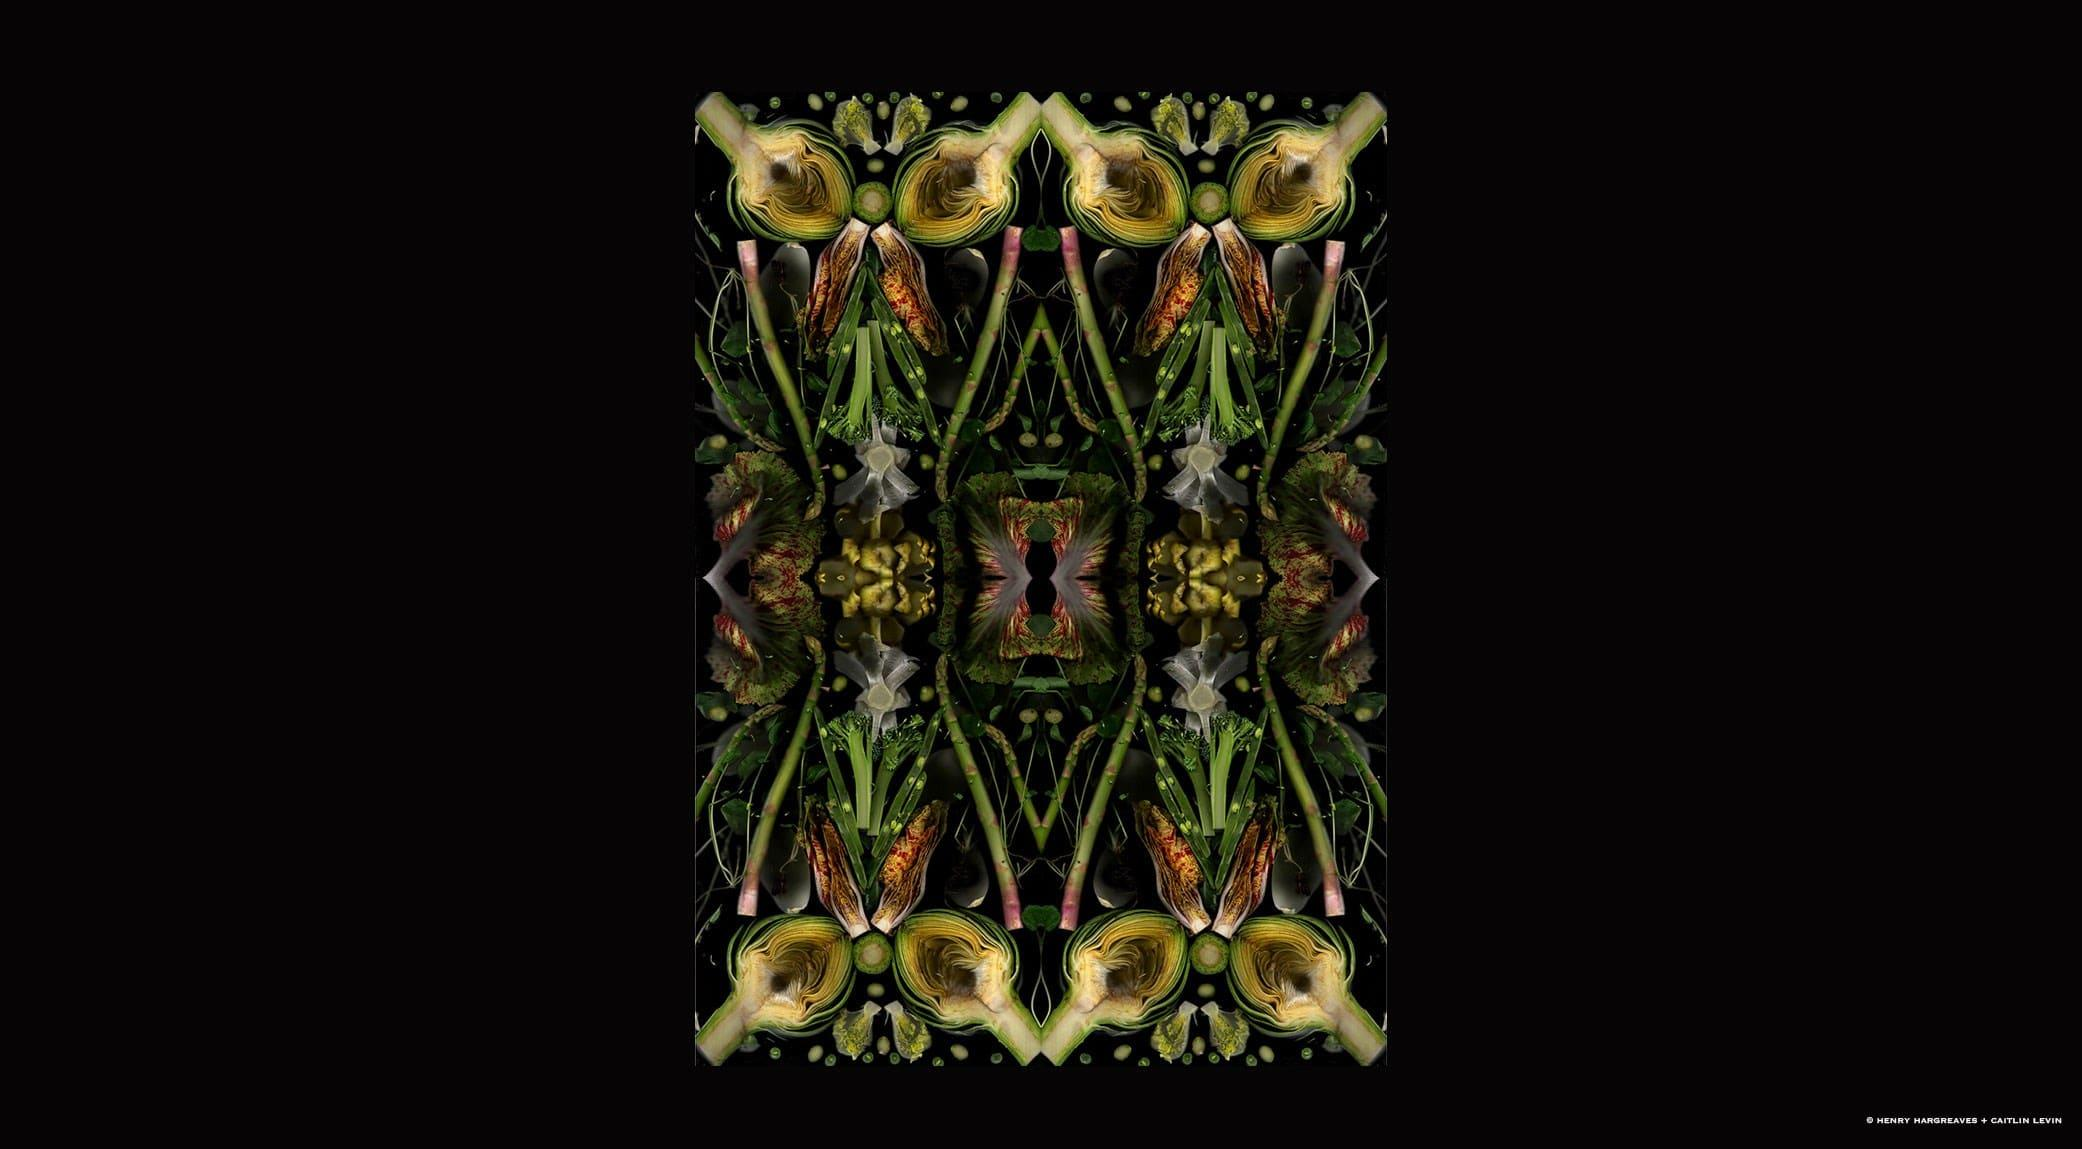 original_03-henry-hargreaves-caitlin-levin-finedininglovers.jpg